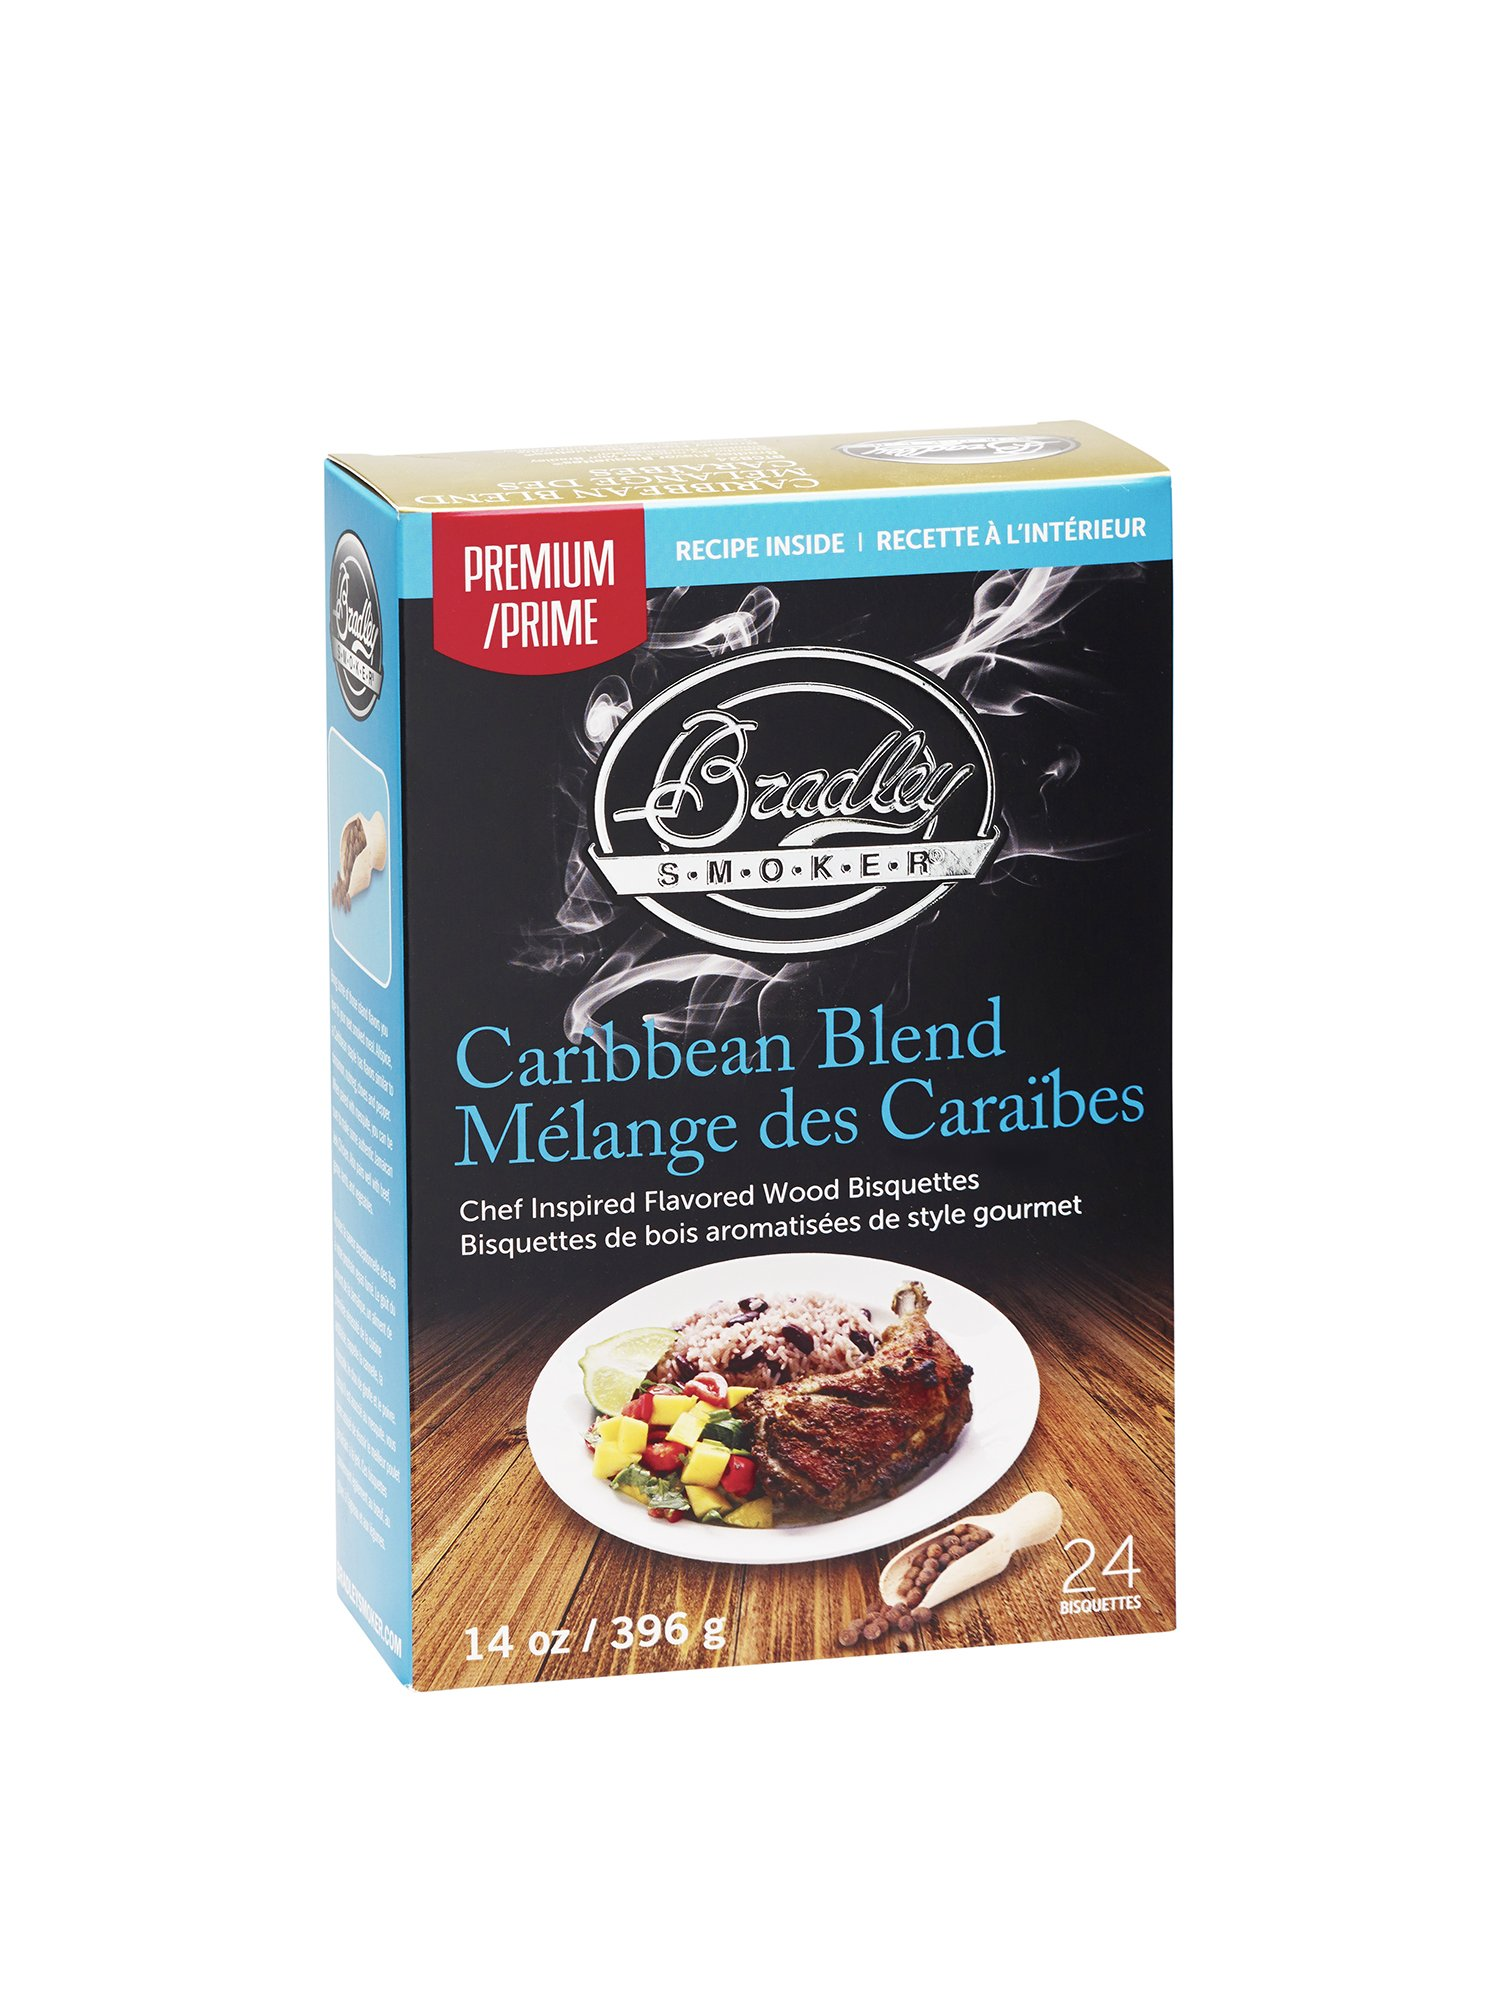 Bradley Smoker Caribbean Blend Bisquettes (24 Pack)